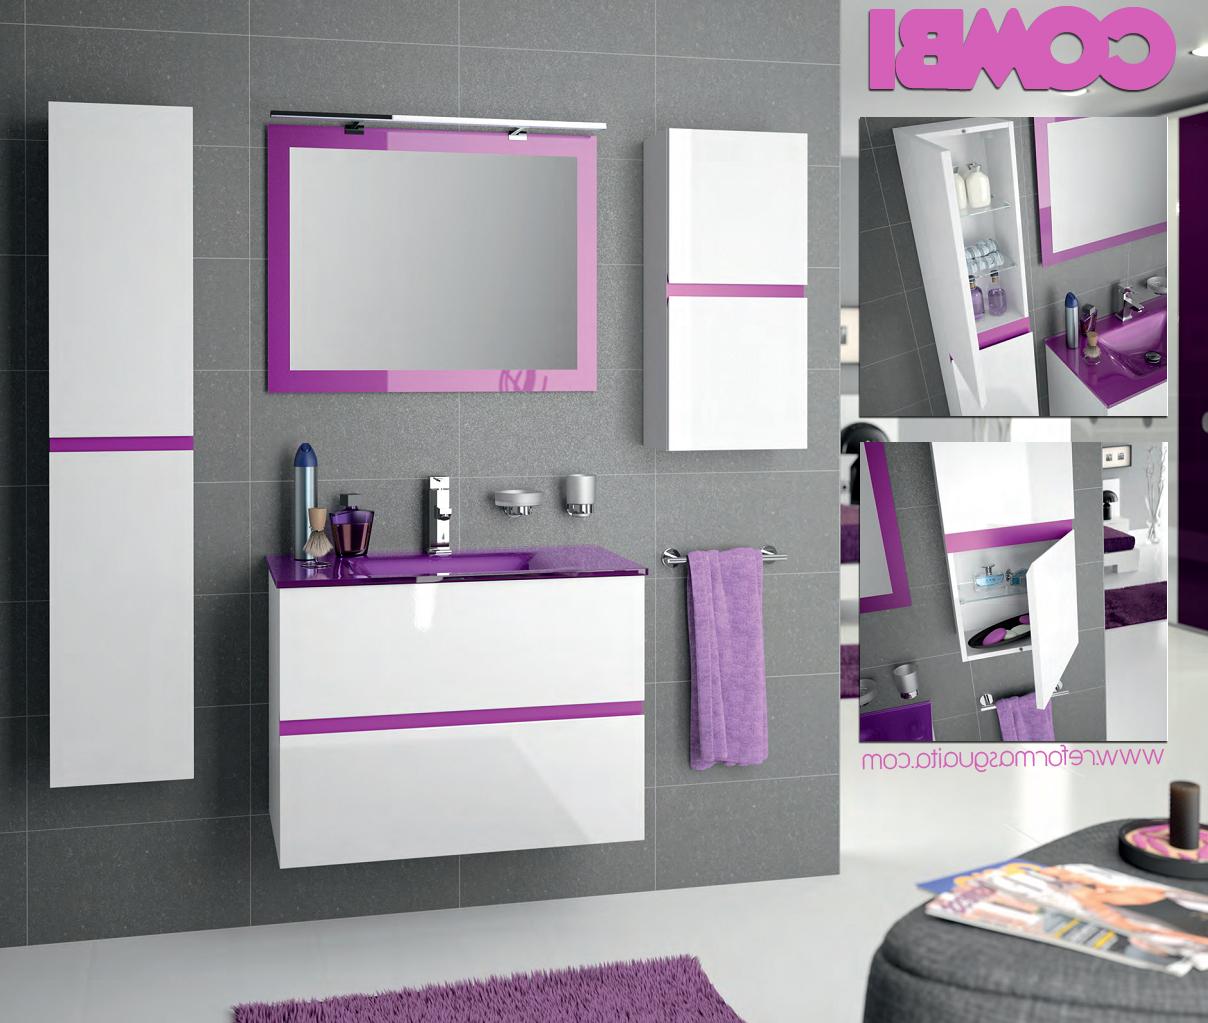 Tiradores Muebles Baño Rldj Bi Muebles Para Darle Un toque De Color Al Baà O